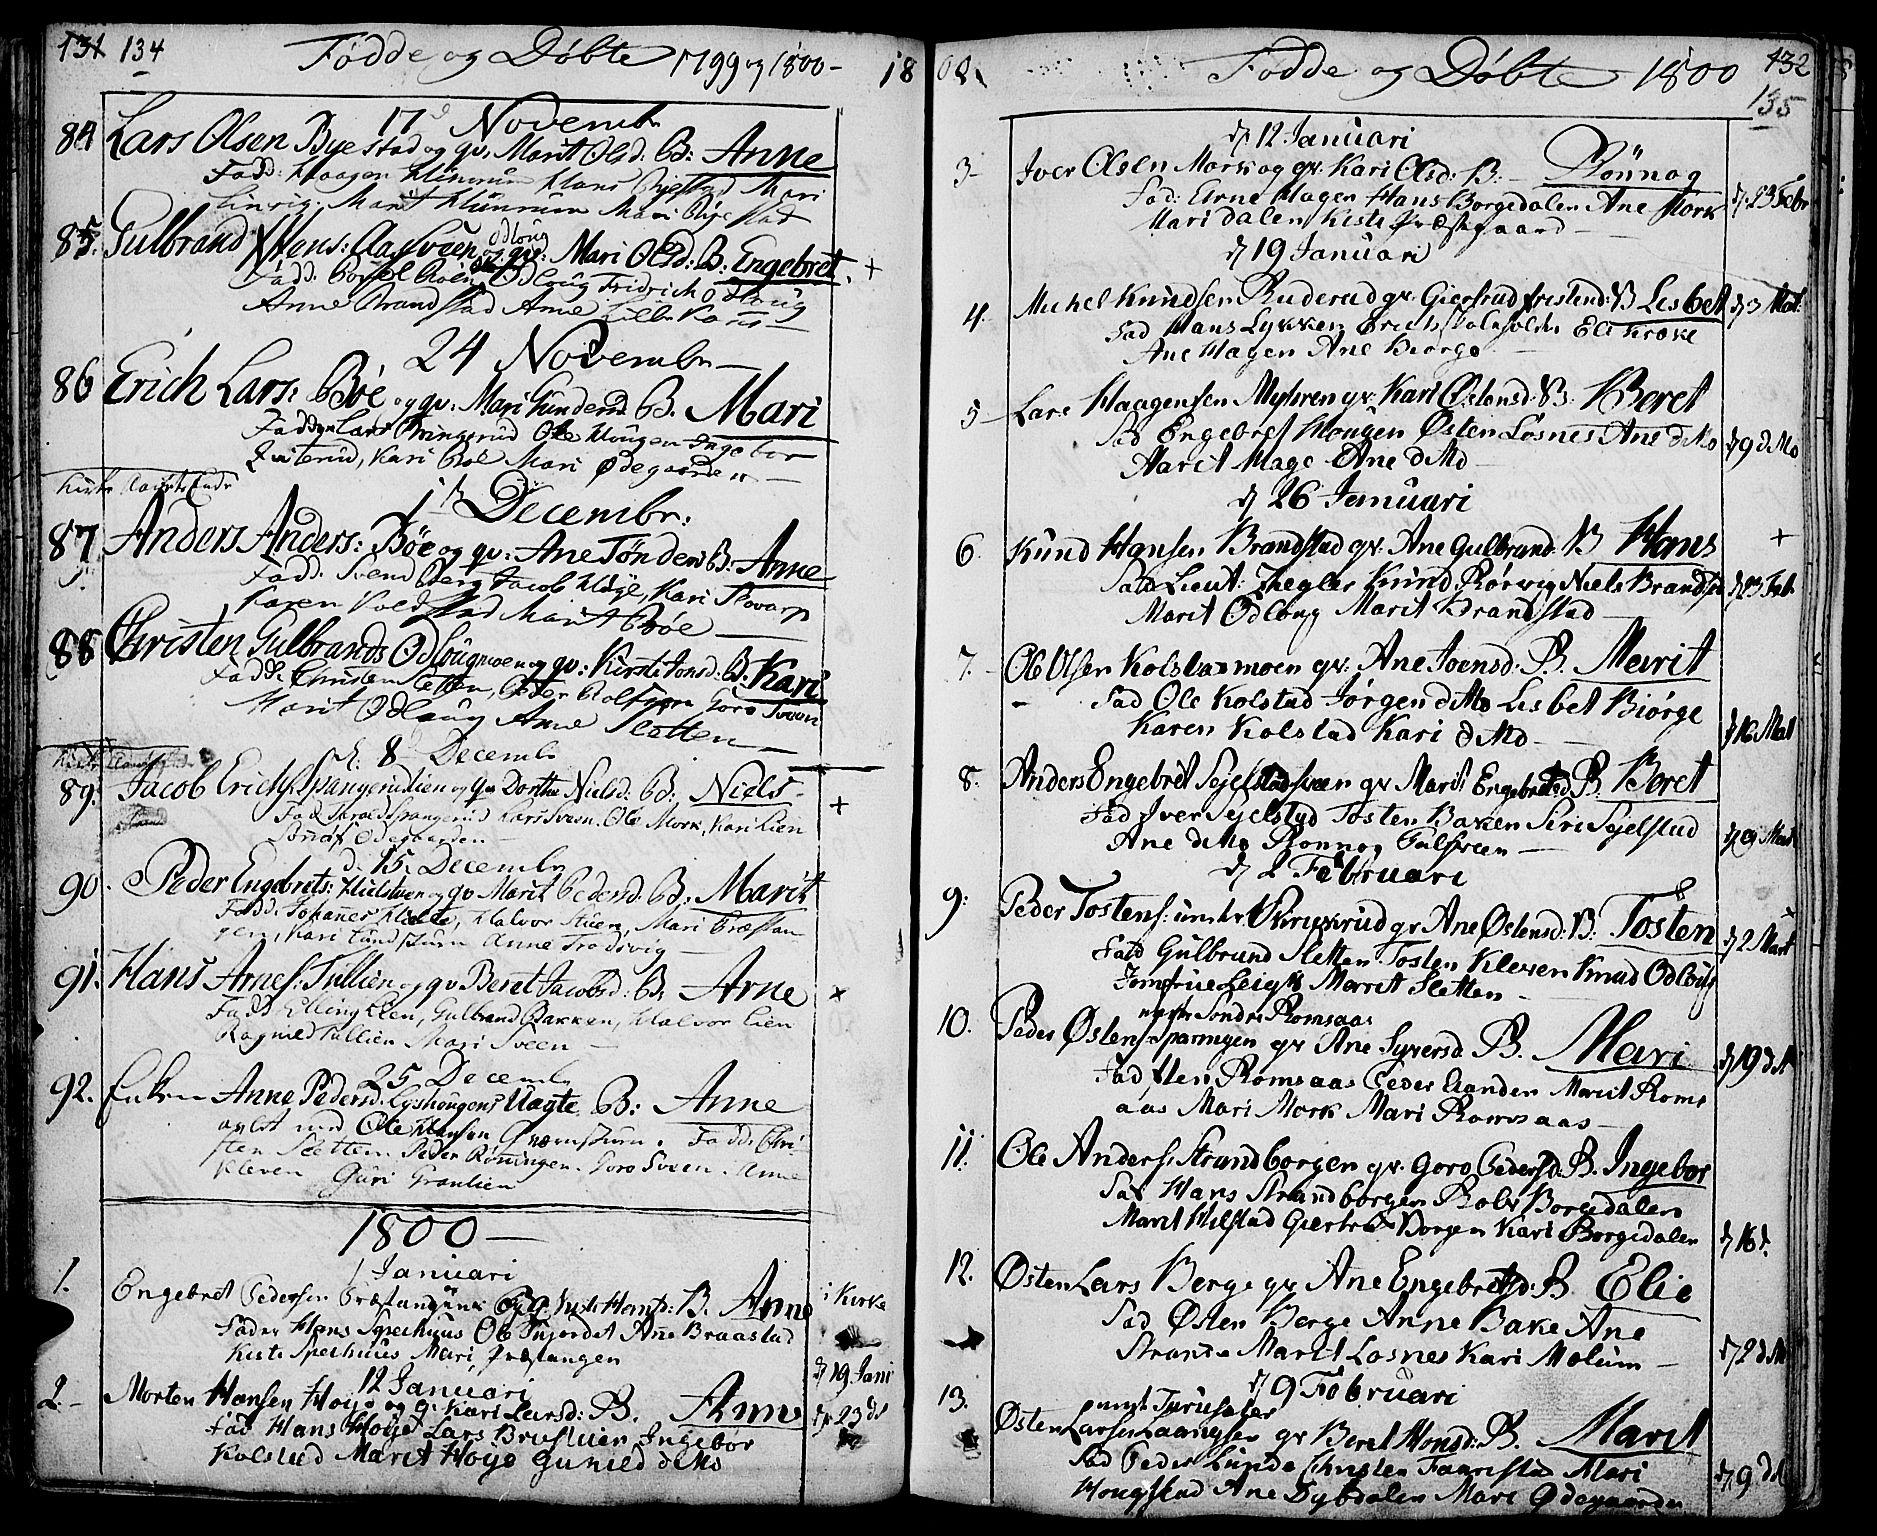 SAH, Ringebu prestekontor, Ministerialbok nr. 3, 1781-1820, s. 134-135